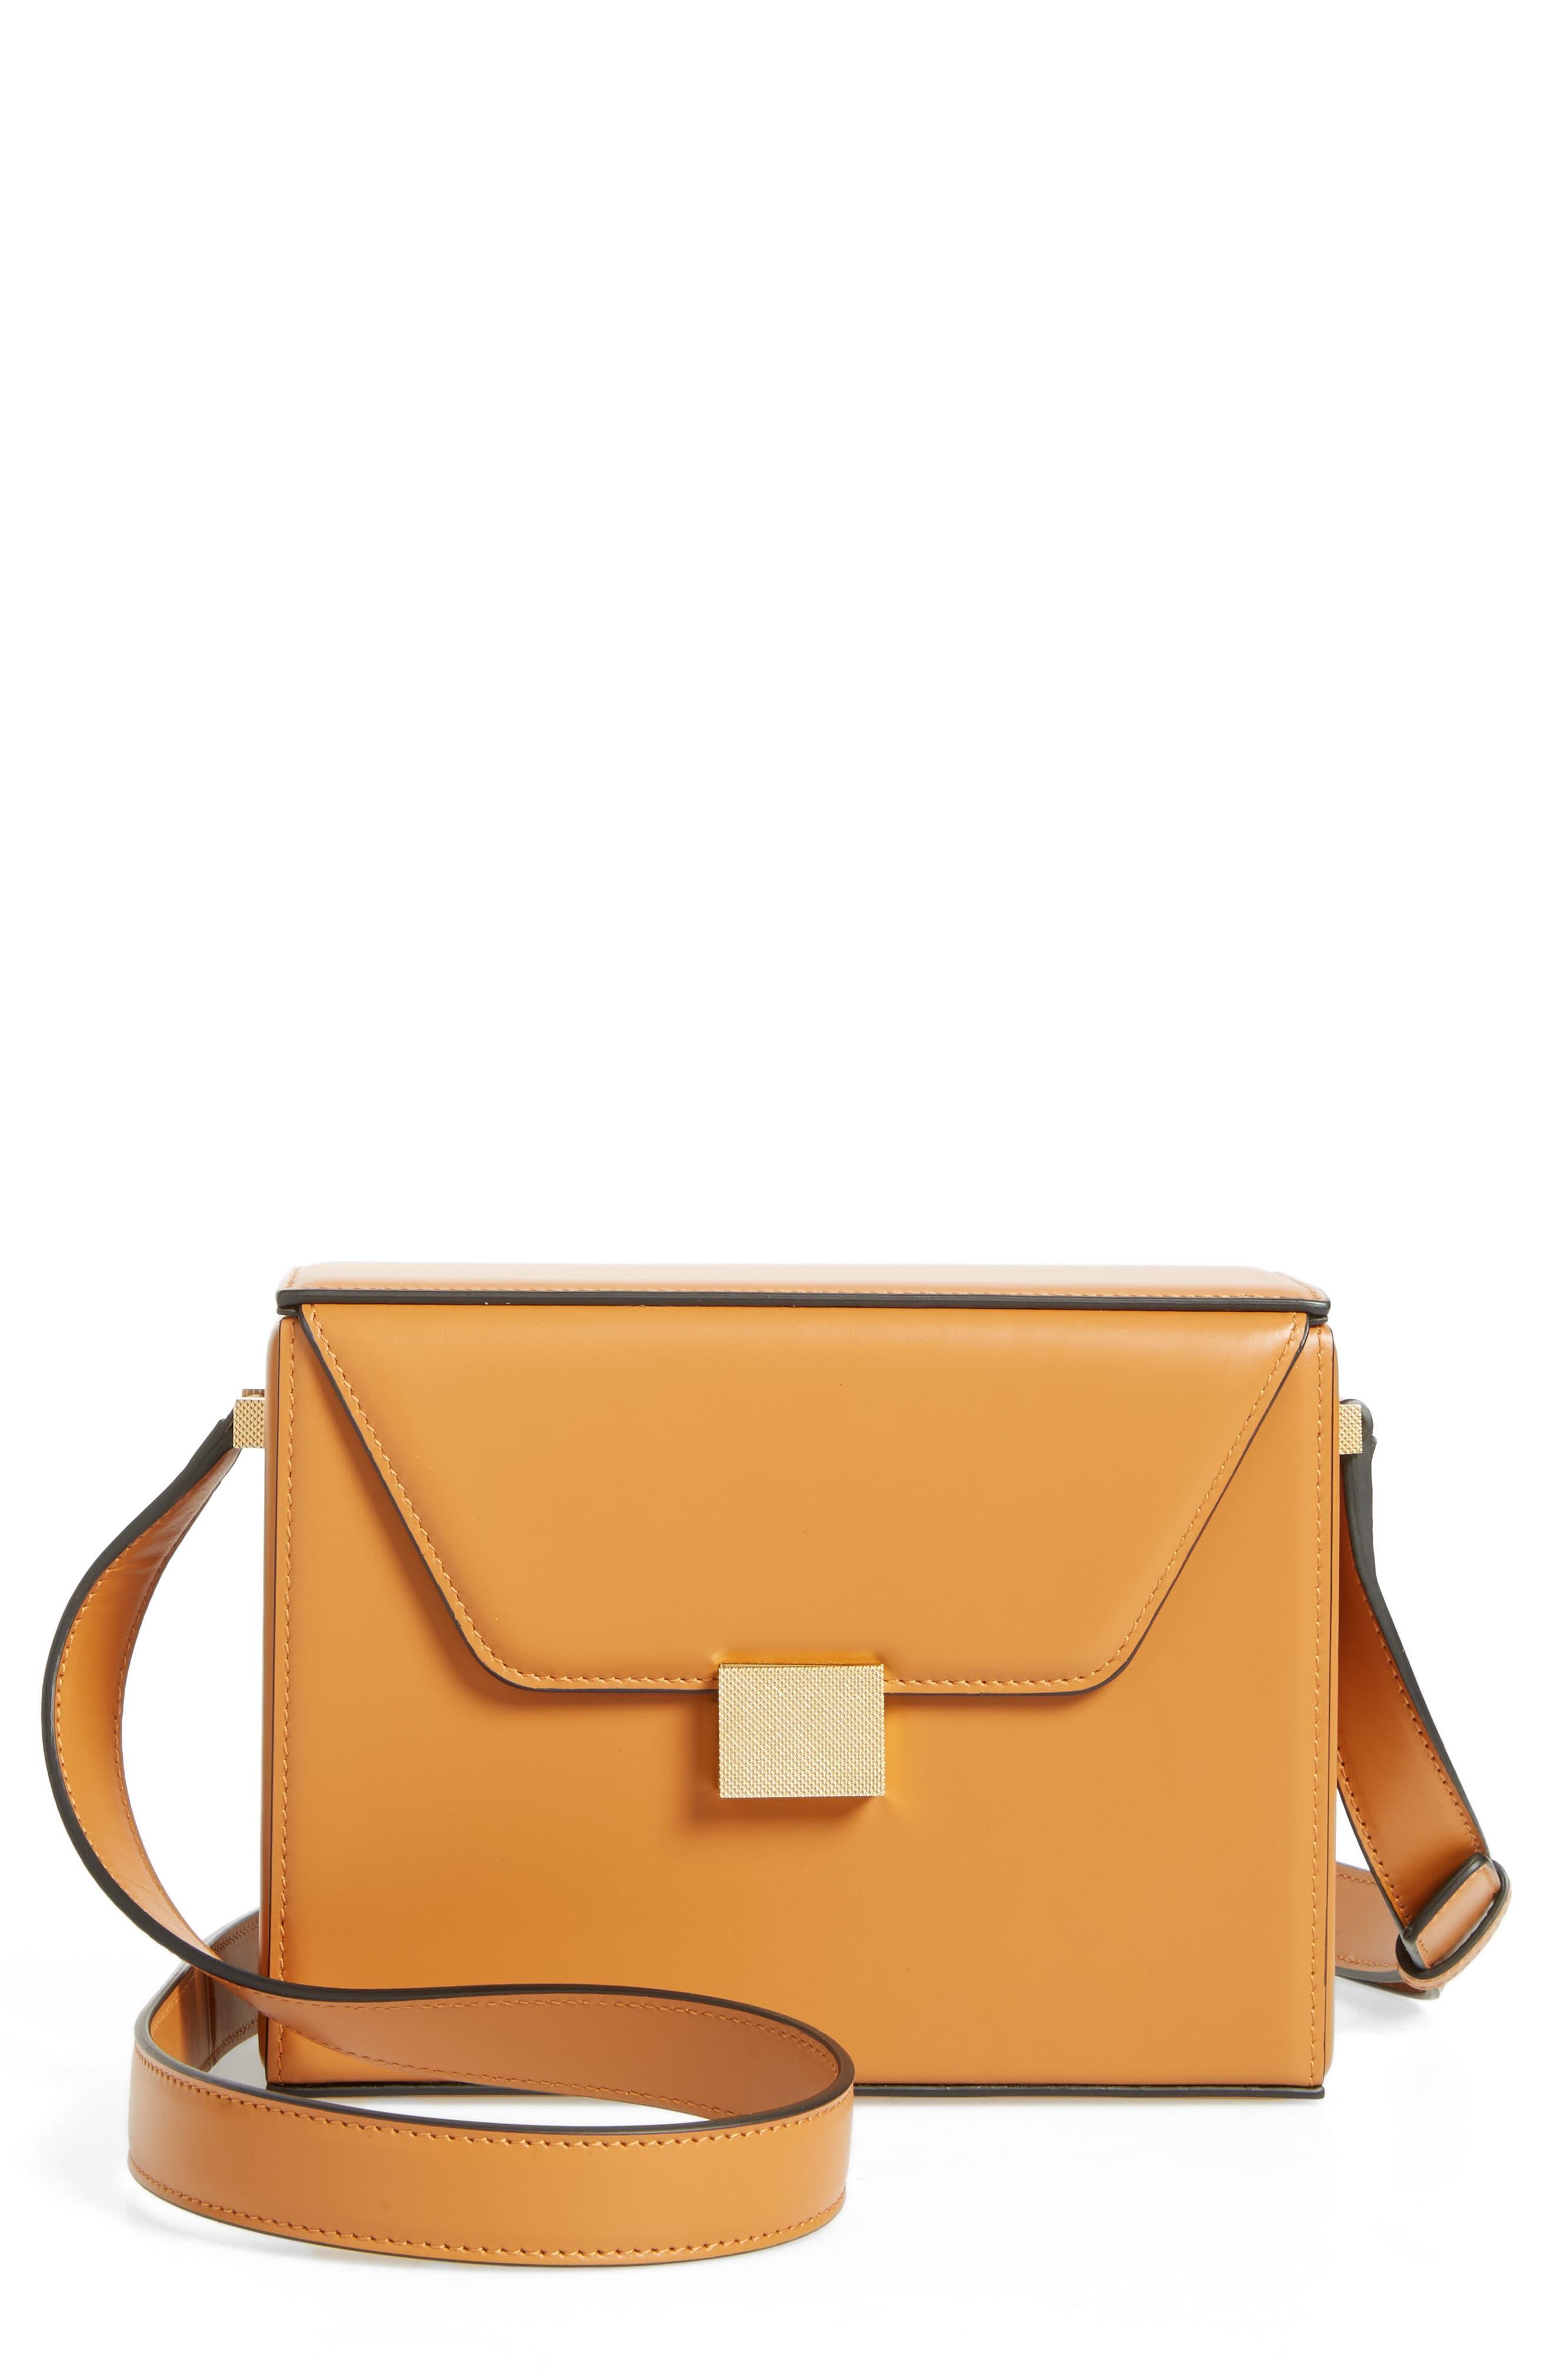 Alternate Image 1 Selected - Victoria Beckham Vanity Calfskin Leather Box Bag